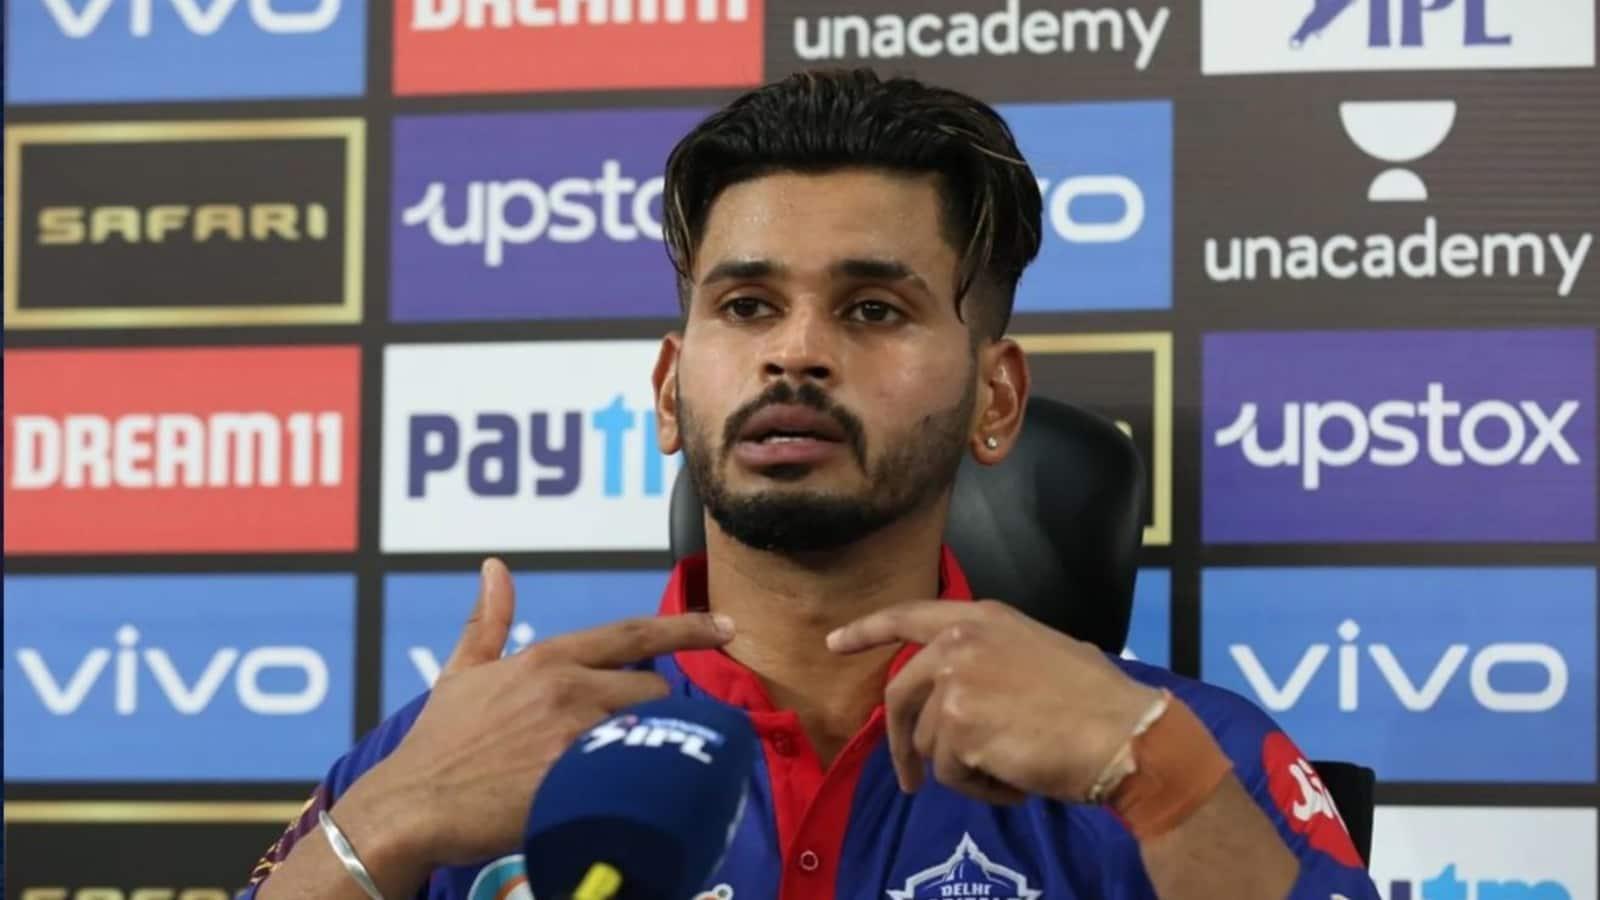 Rishabh Pant shares childhood memories in the Indian Premier League: IPL 2021